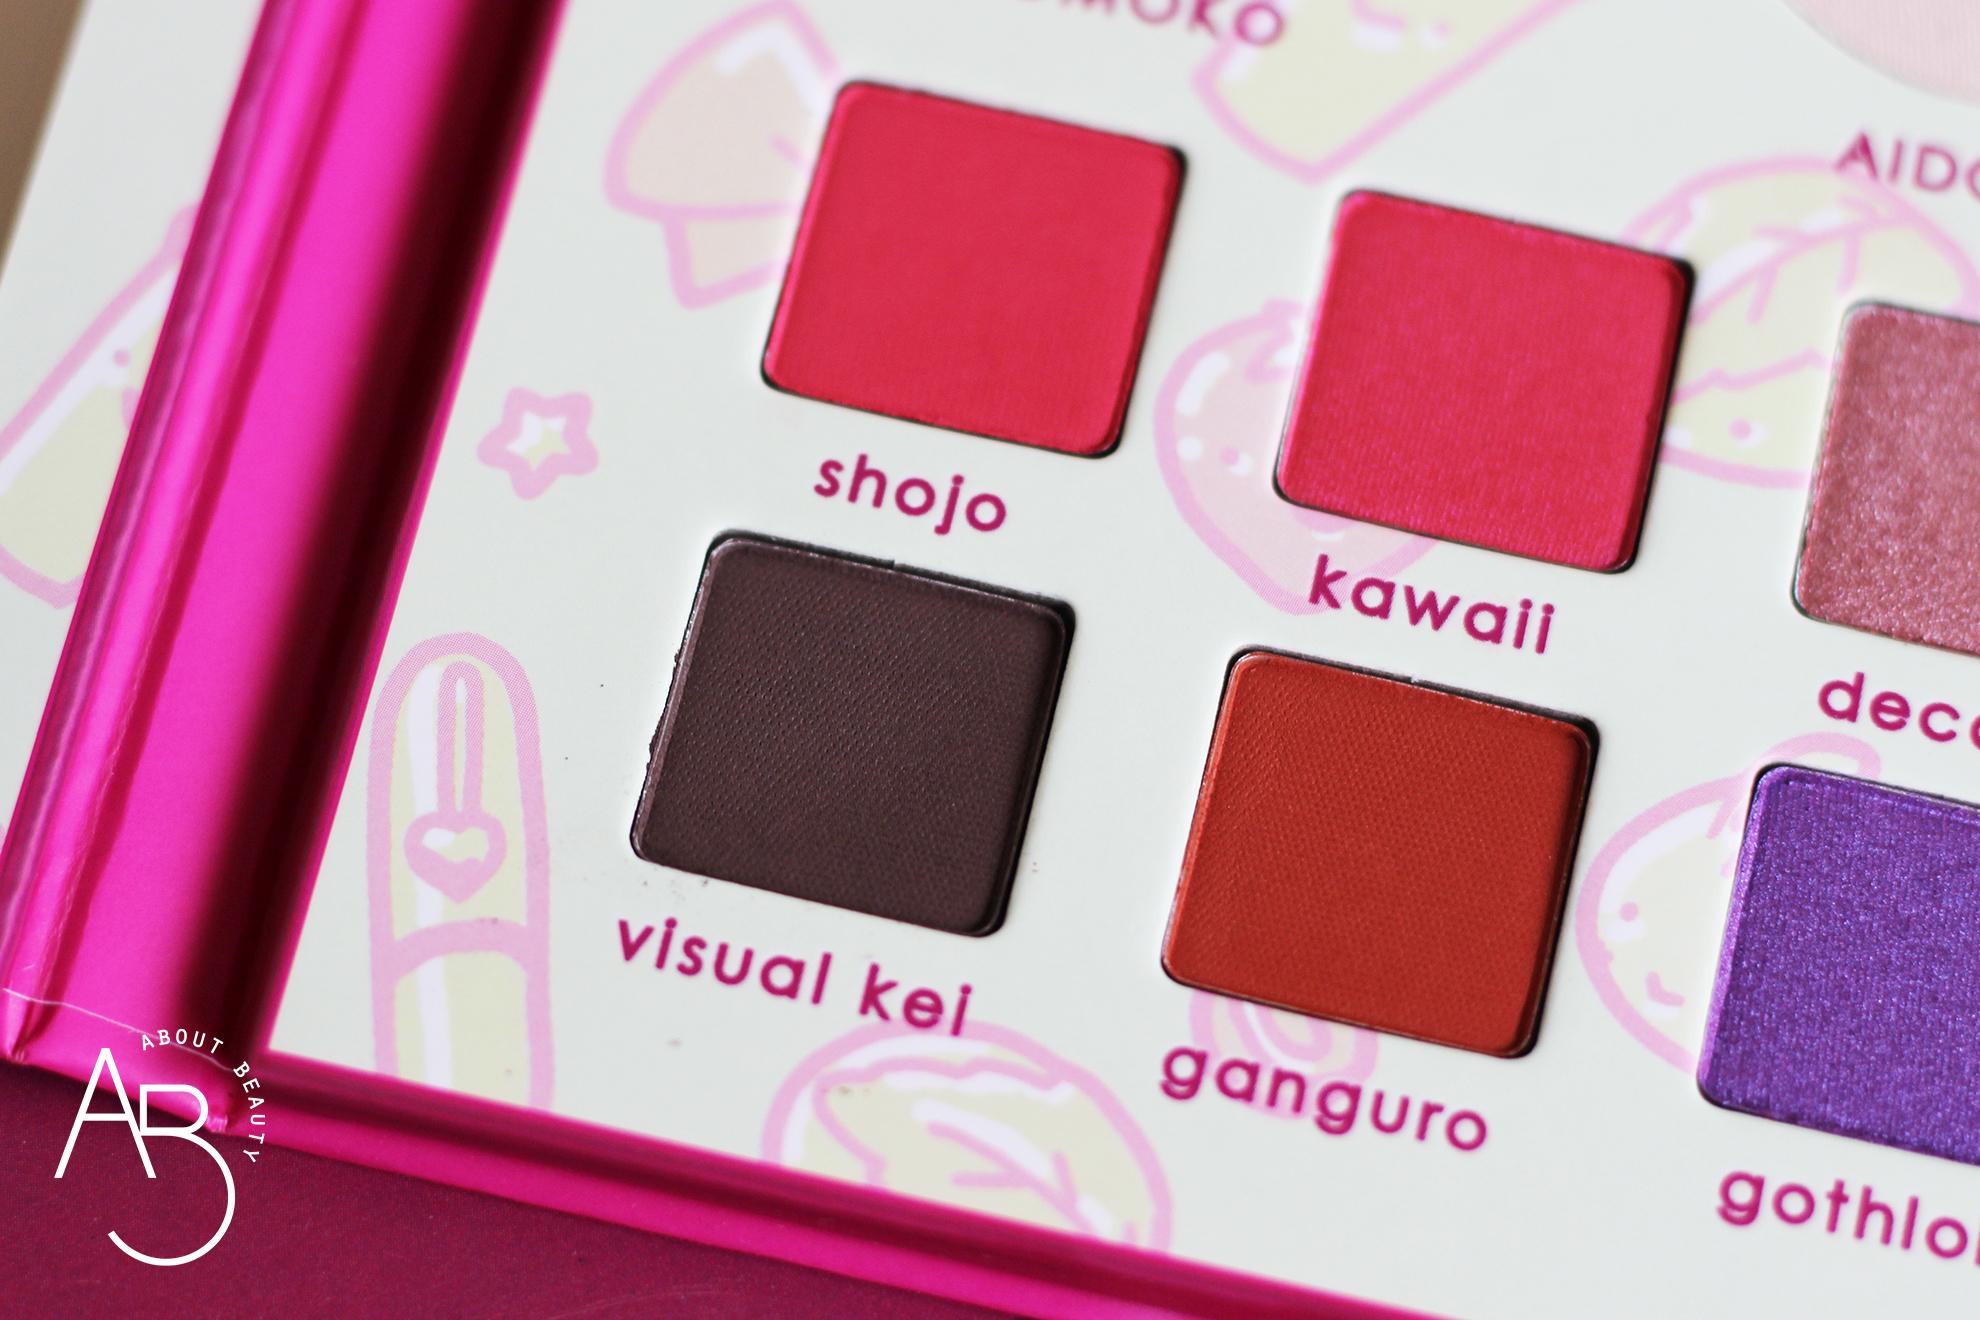 neve cosmetics harajuku memoir palette ombretti eyeshadow - info recensione swatch inci opinioni review tutorial codice sconto - visual kei